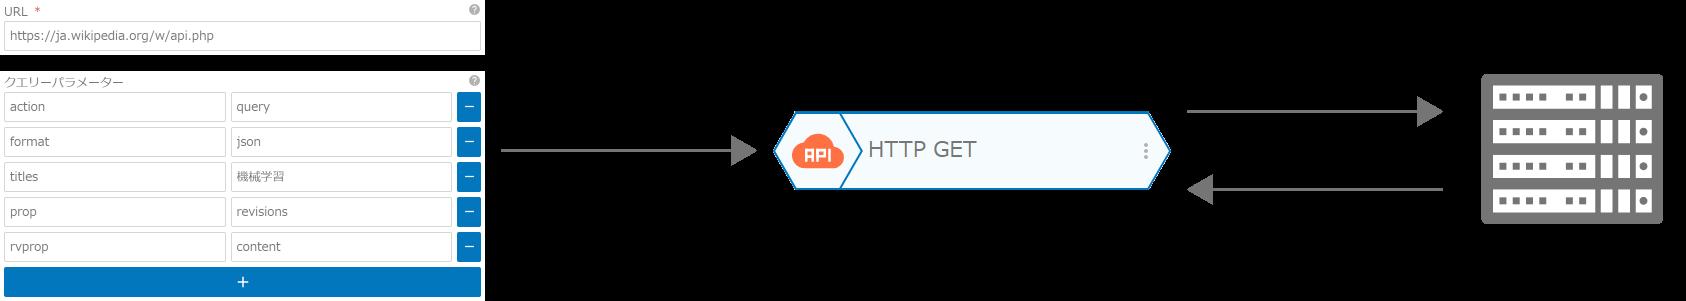 HTTP GET ブロックの概念図